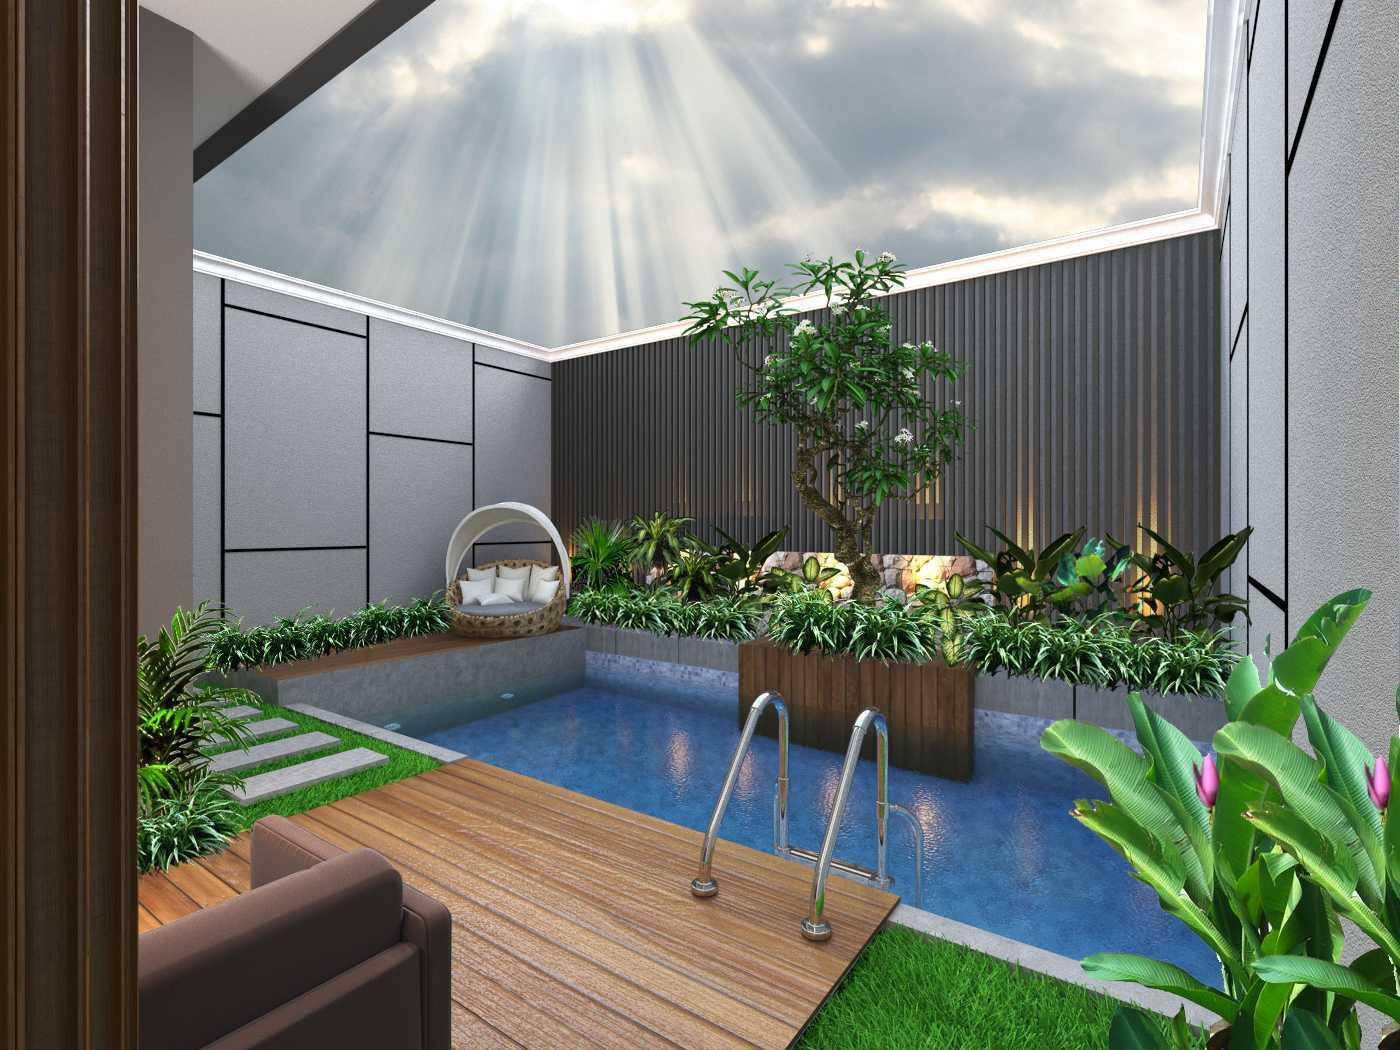 Sense Studio Rumah Tinggal - Kertomenanggal Surabaya, Kota Sby, Jawa Timur, Indonesia Surabaya, Kota Sby, Jawa Timur, Indonesia Sense-Studio-Rumah-Tinggal-Kertomenanggal   51656